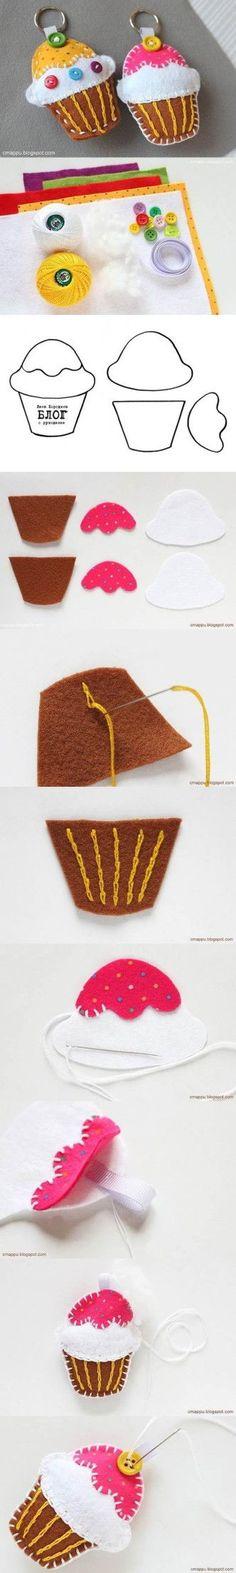 DIY Felt Cupcake Keychain 2                                                                                                                                                      More